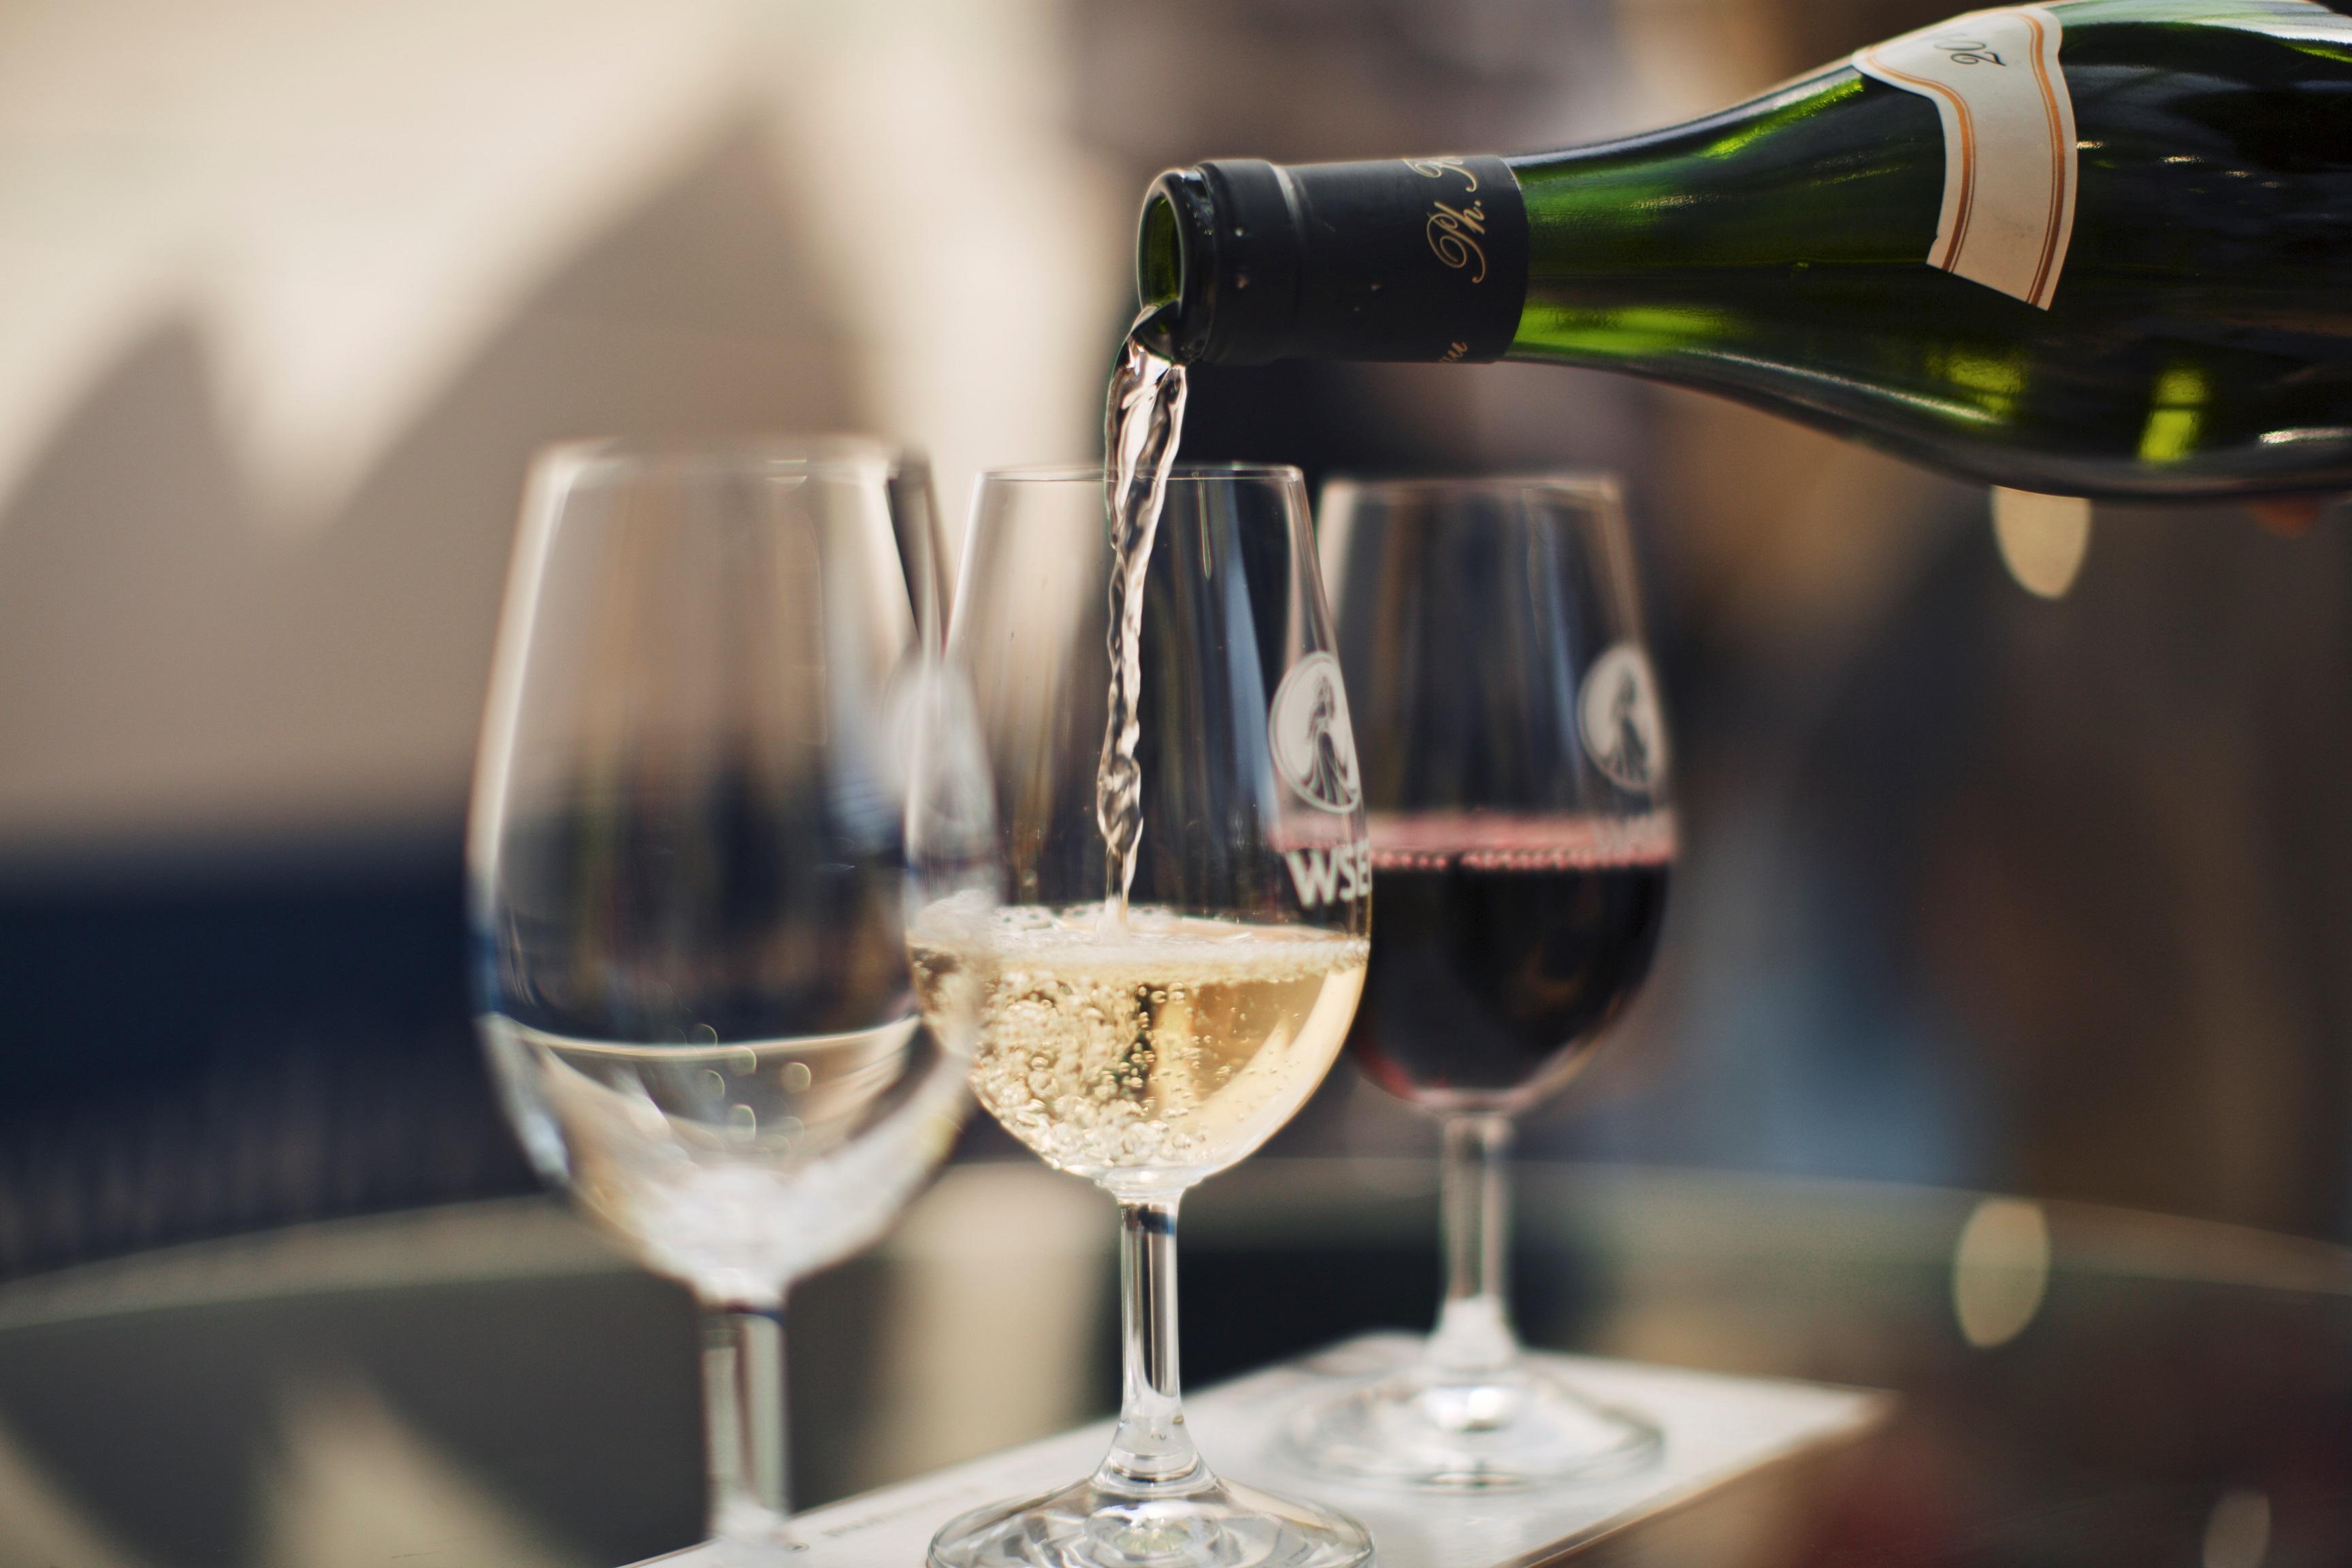 WSET-Wine-Image.jpg